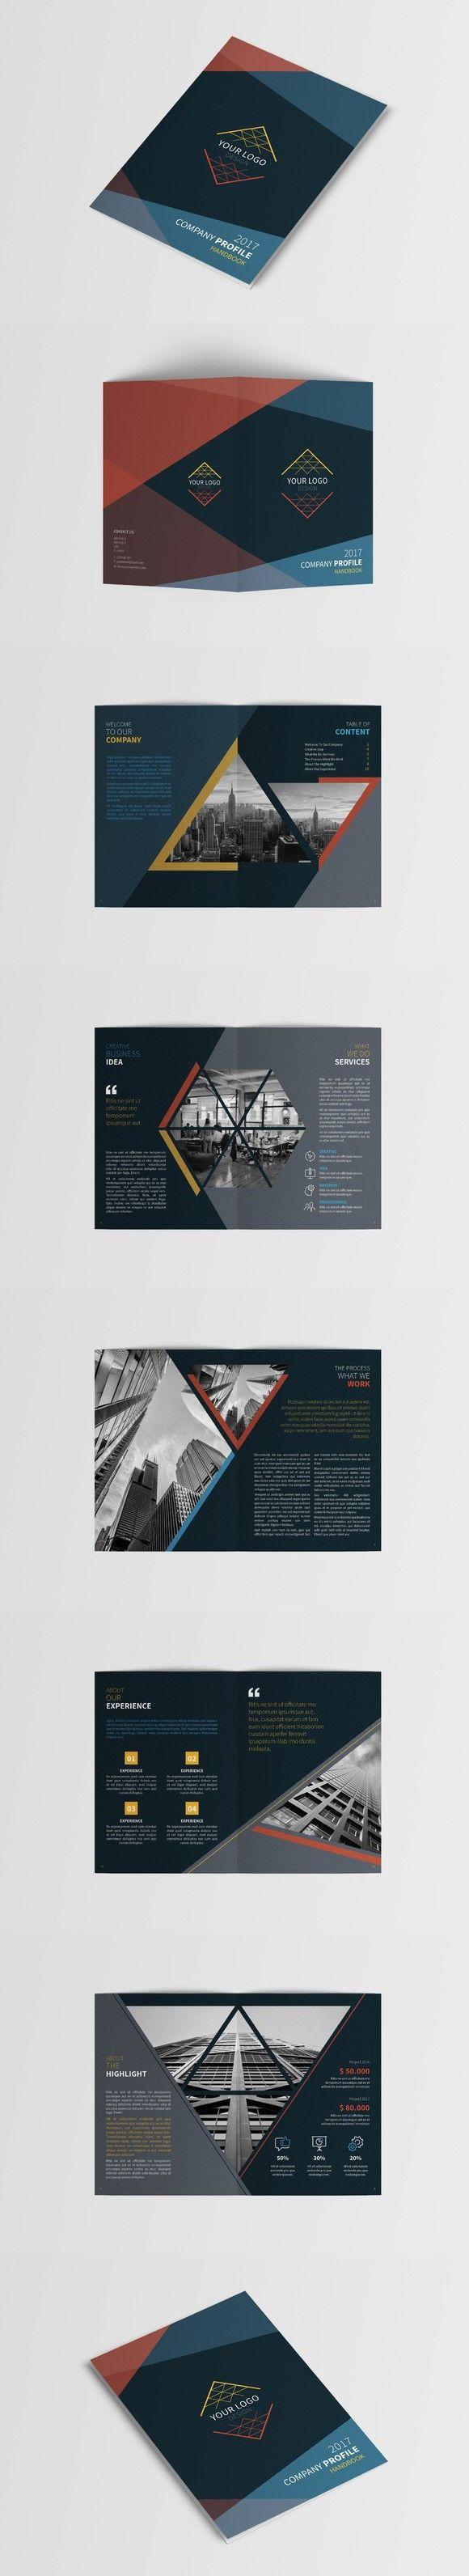 A5 Company Profile. $10.00